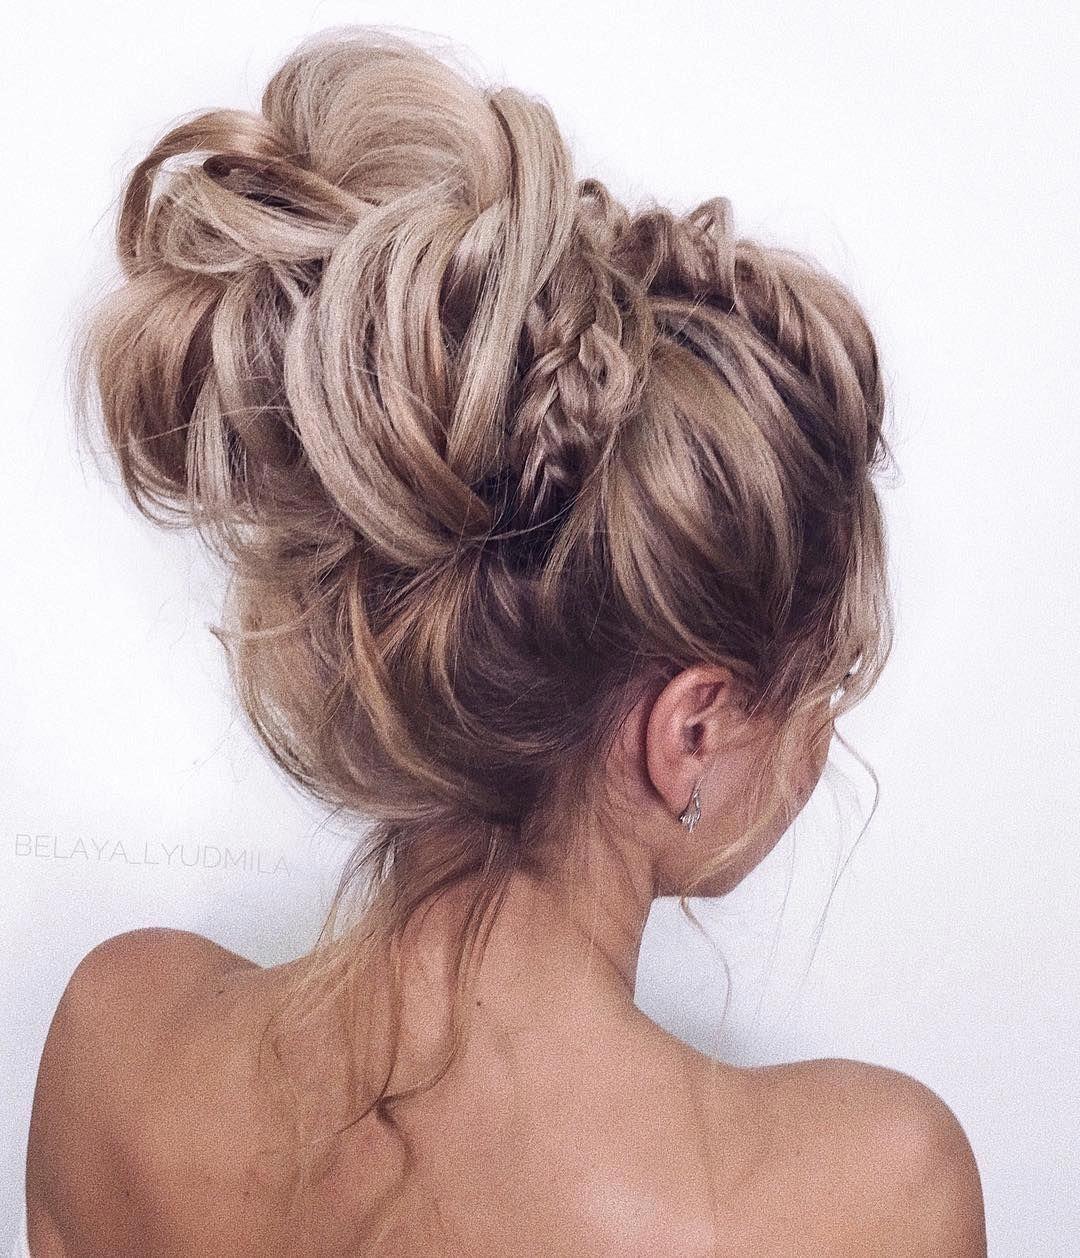 35 gorgeous updo wedding hairstyle inspiration , braids